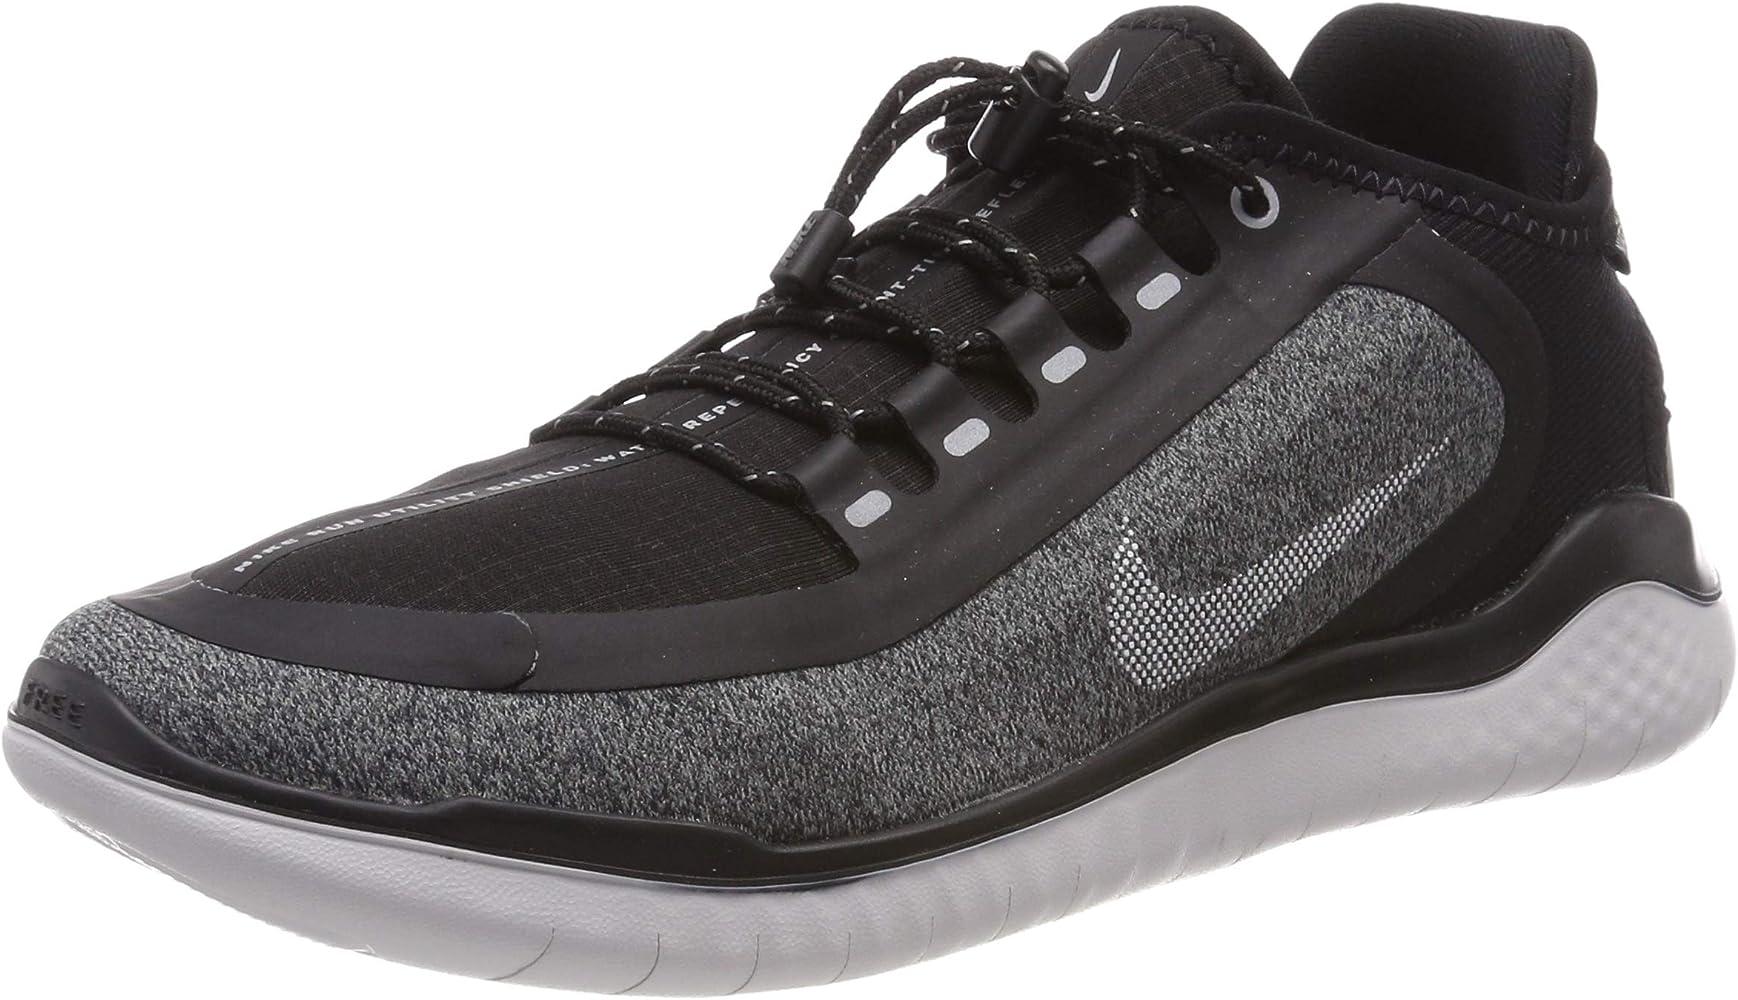 Free RN 2018 Shield Running Shoe Black